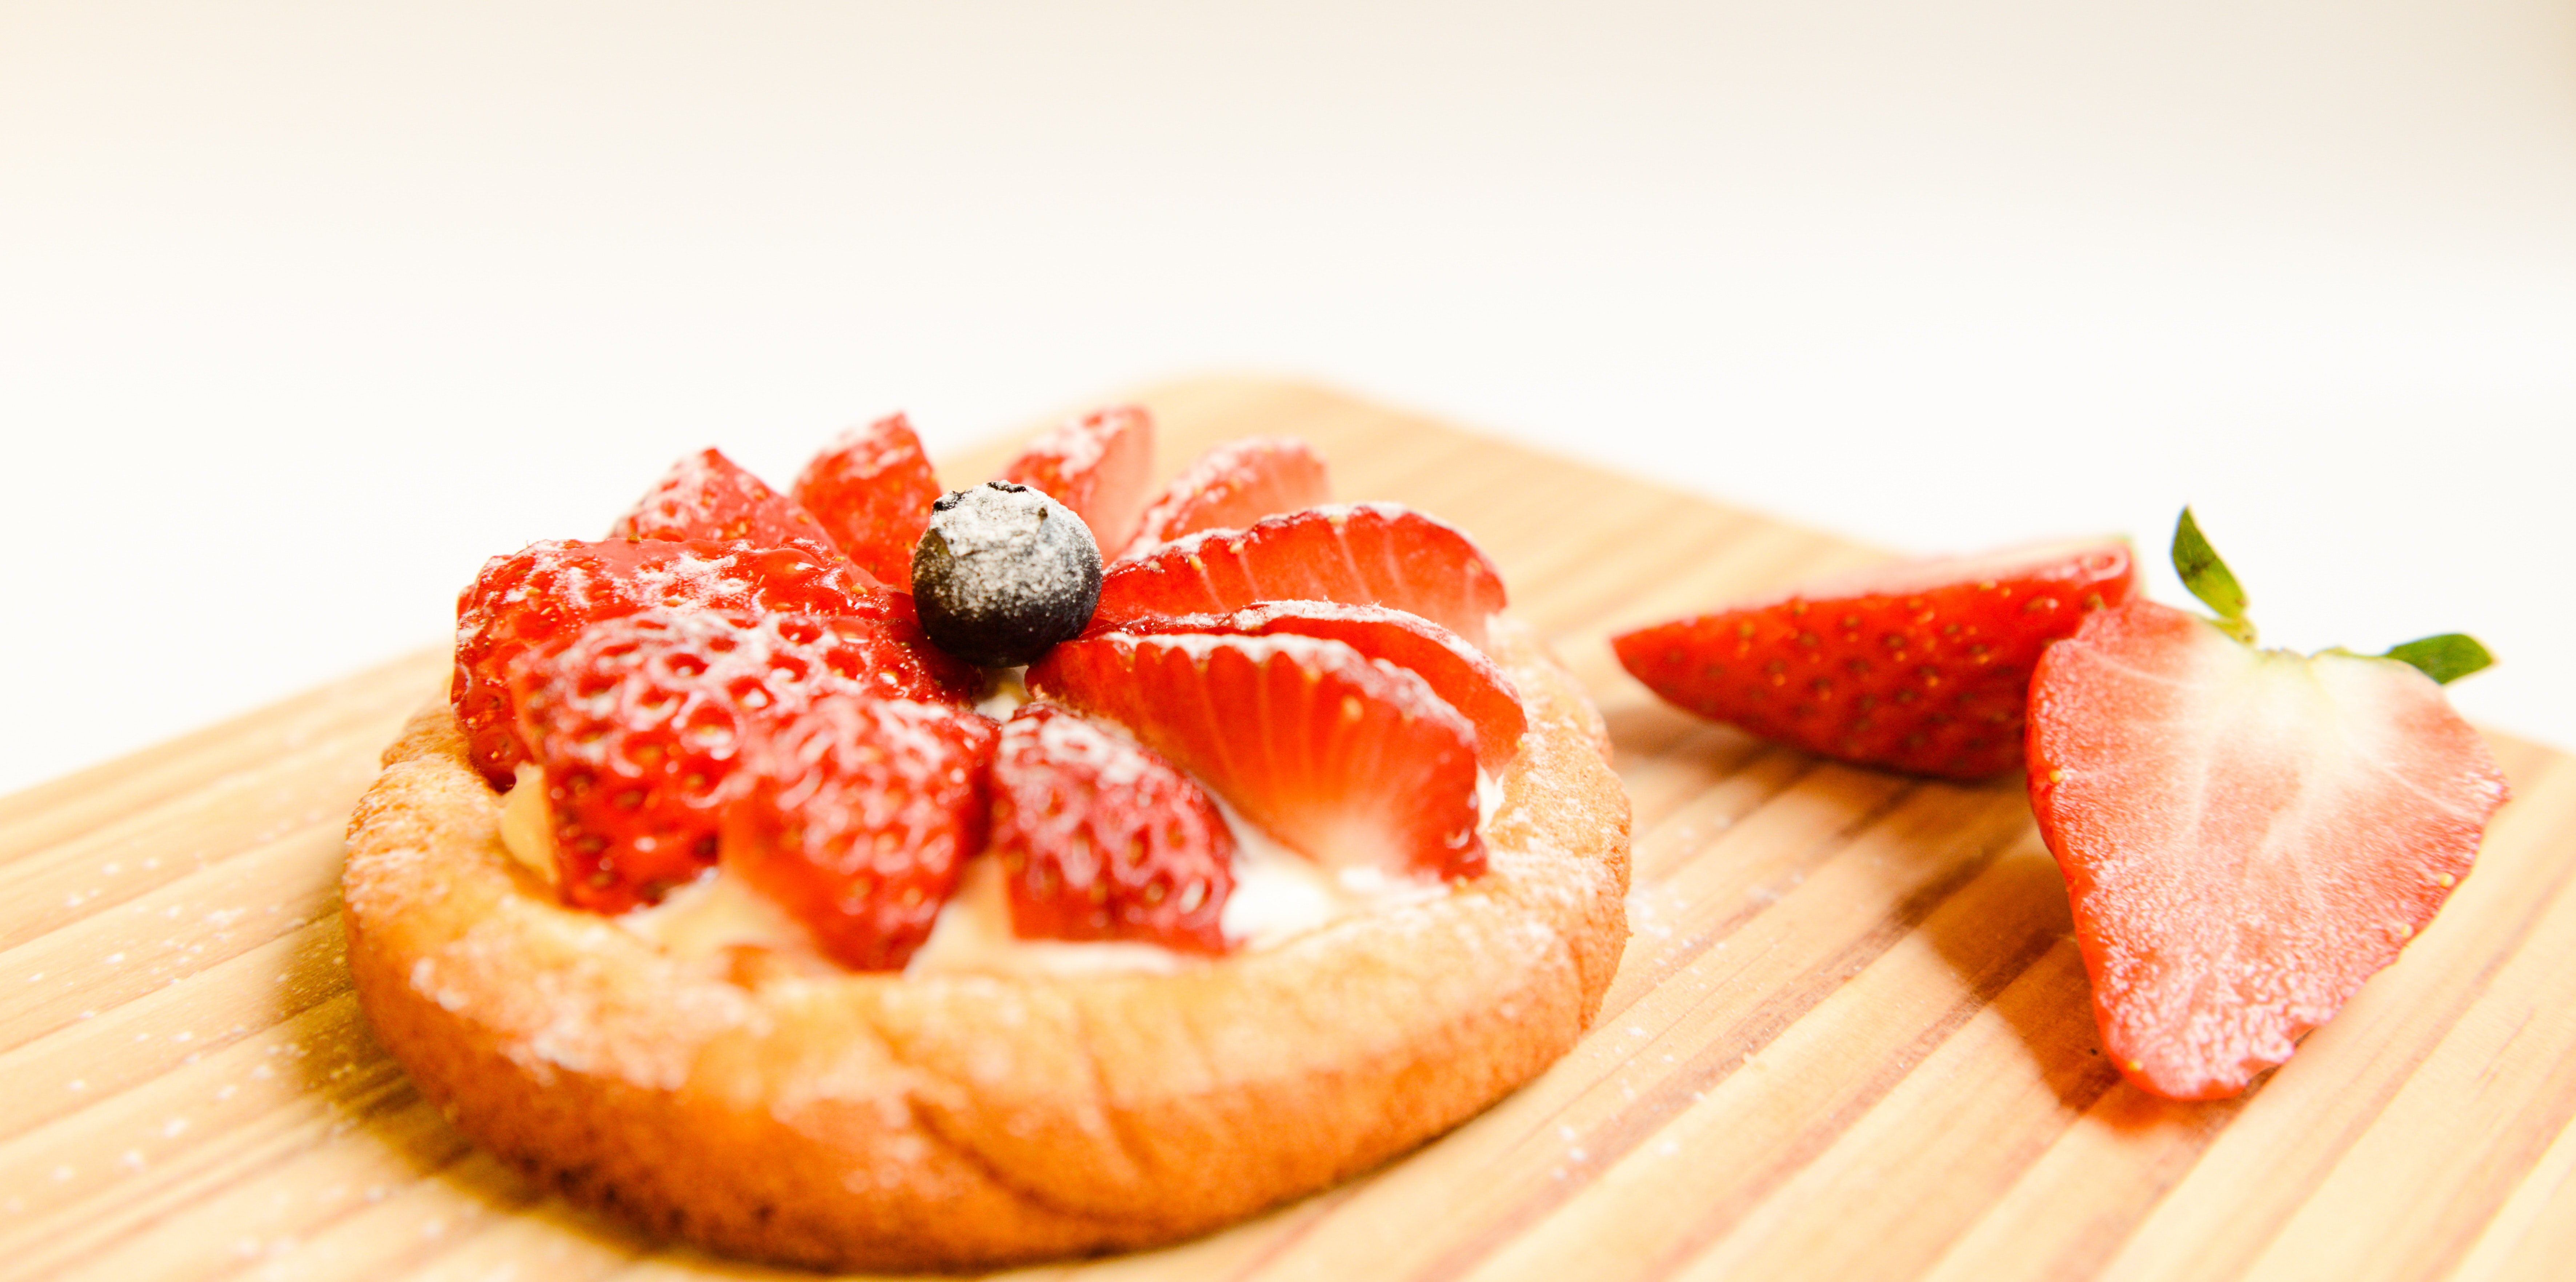 Strawberry Cake, Berries, Cake, Close-up, Close -up, HQ Photo